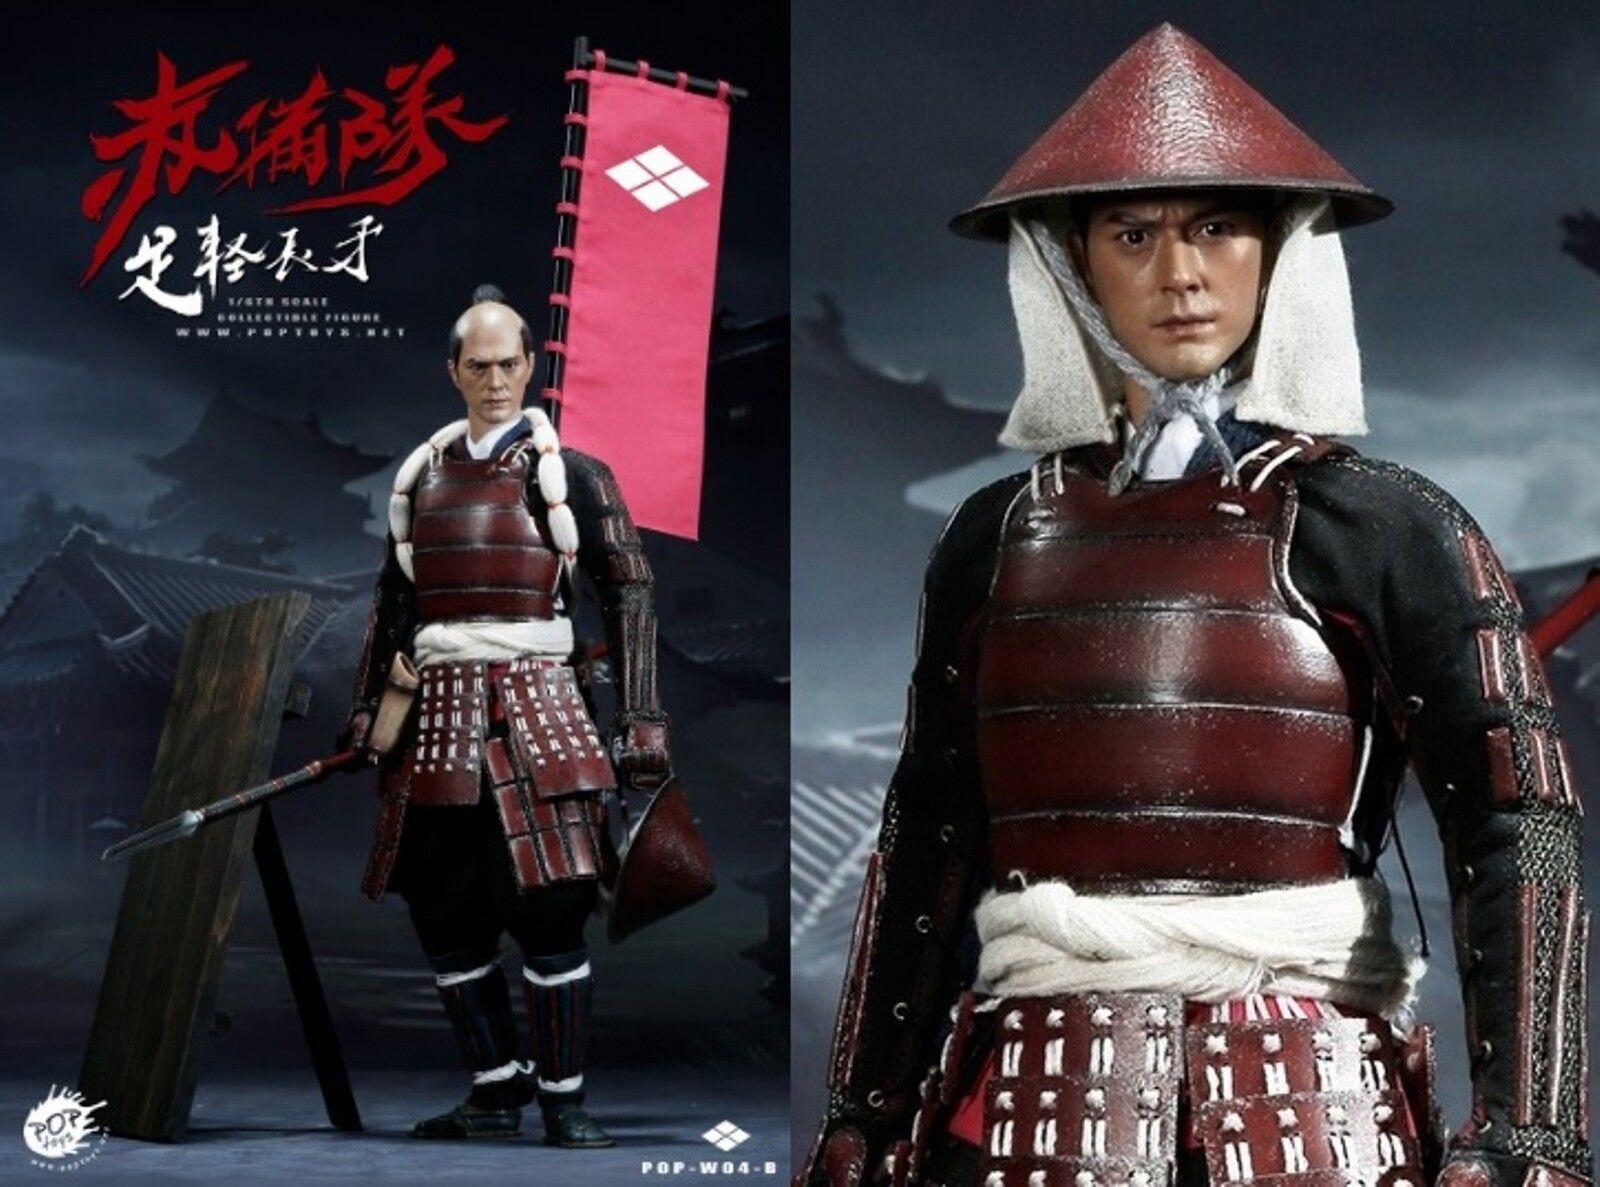 Poptoys 1 6 Maßstab Ashigaru-Spear Deluxe Version Japanisch Fuß Soldat W04b USA